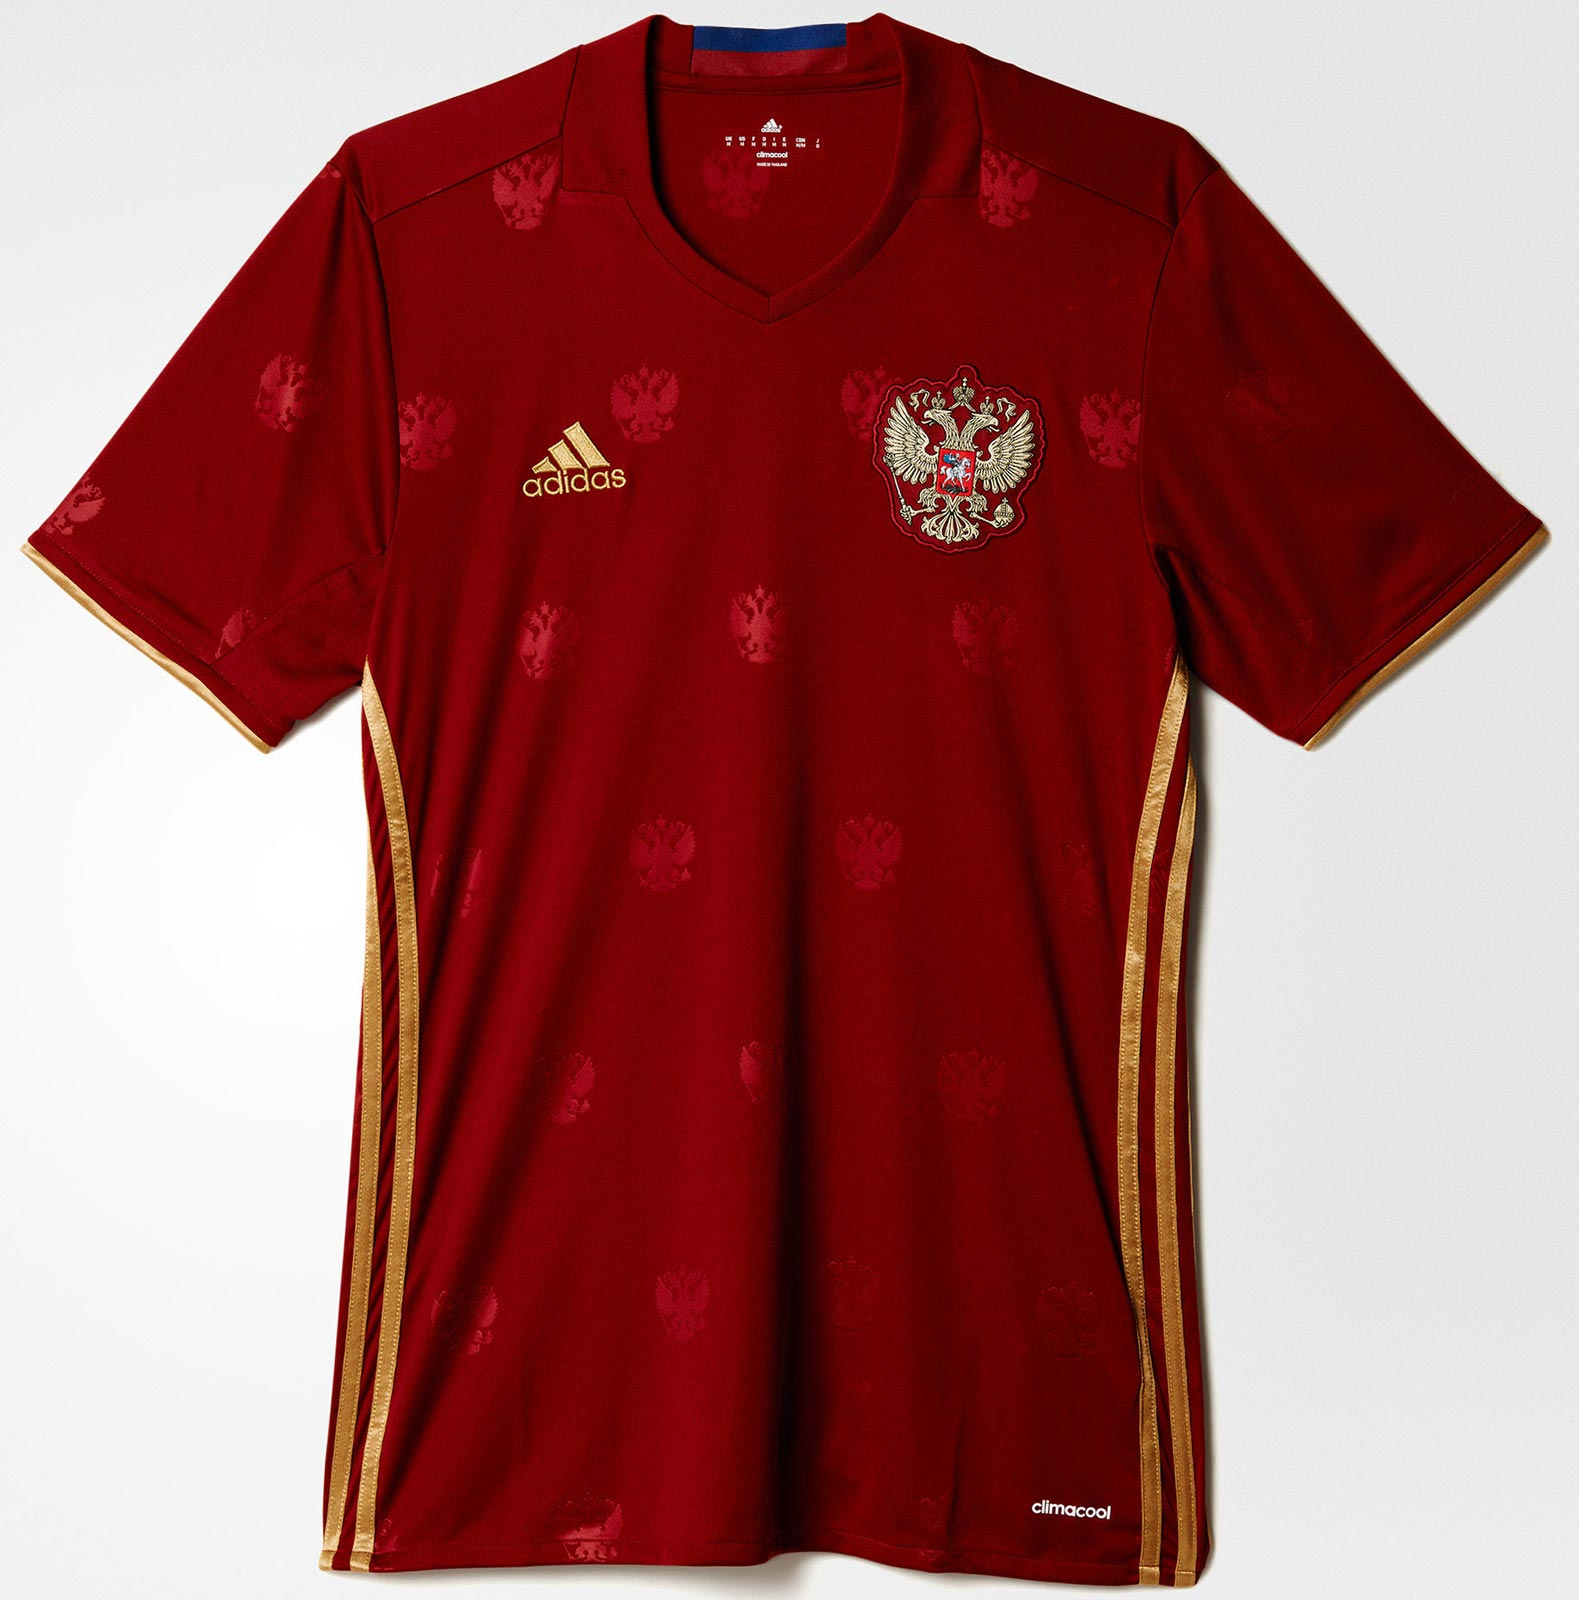 jersey dinamarca 2016